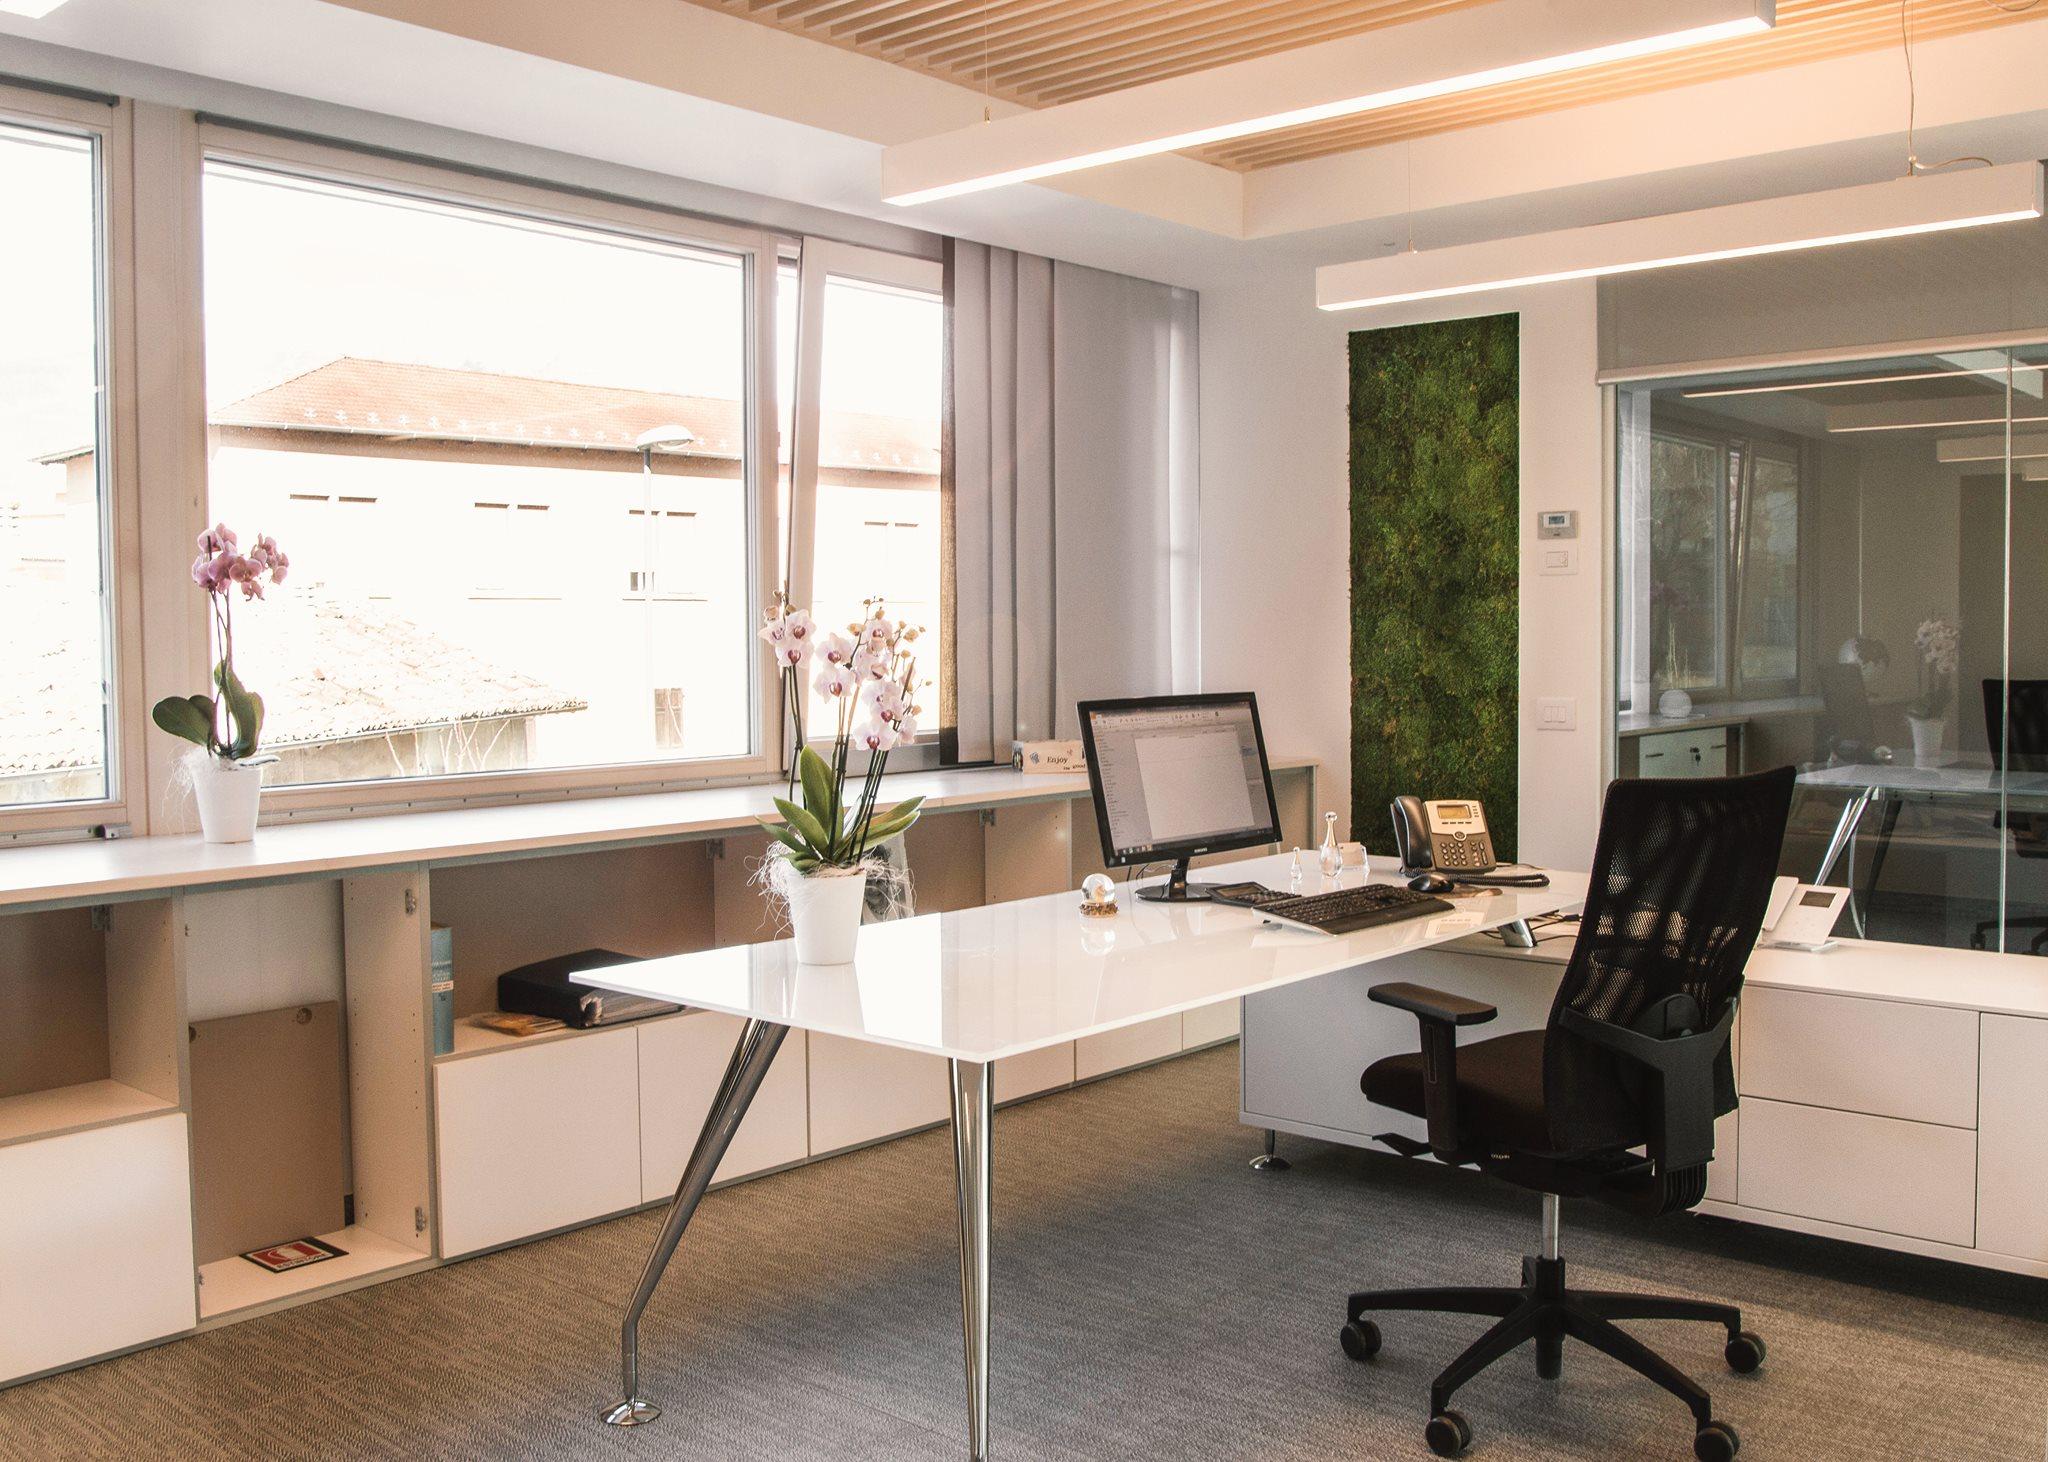 Progettazione di interni uffici direzionali Eurochrome